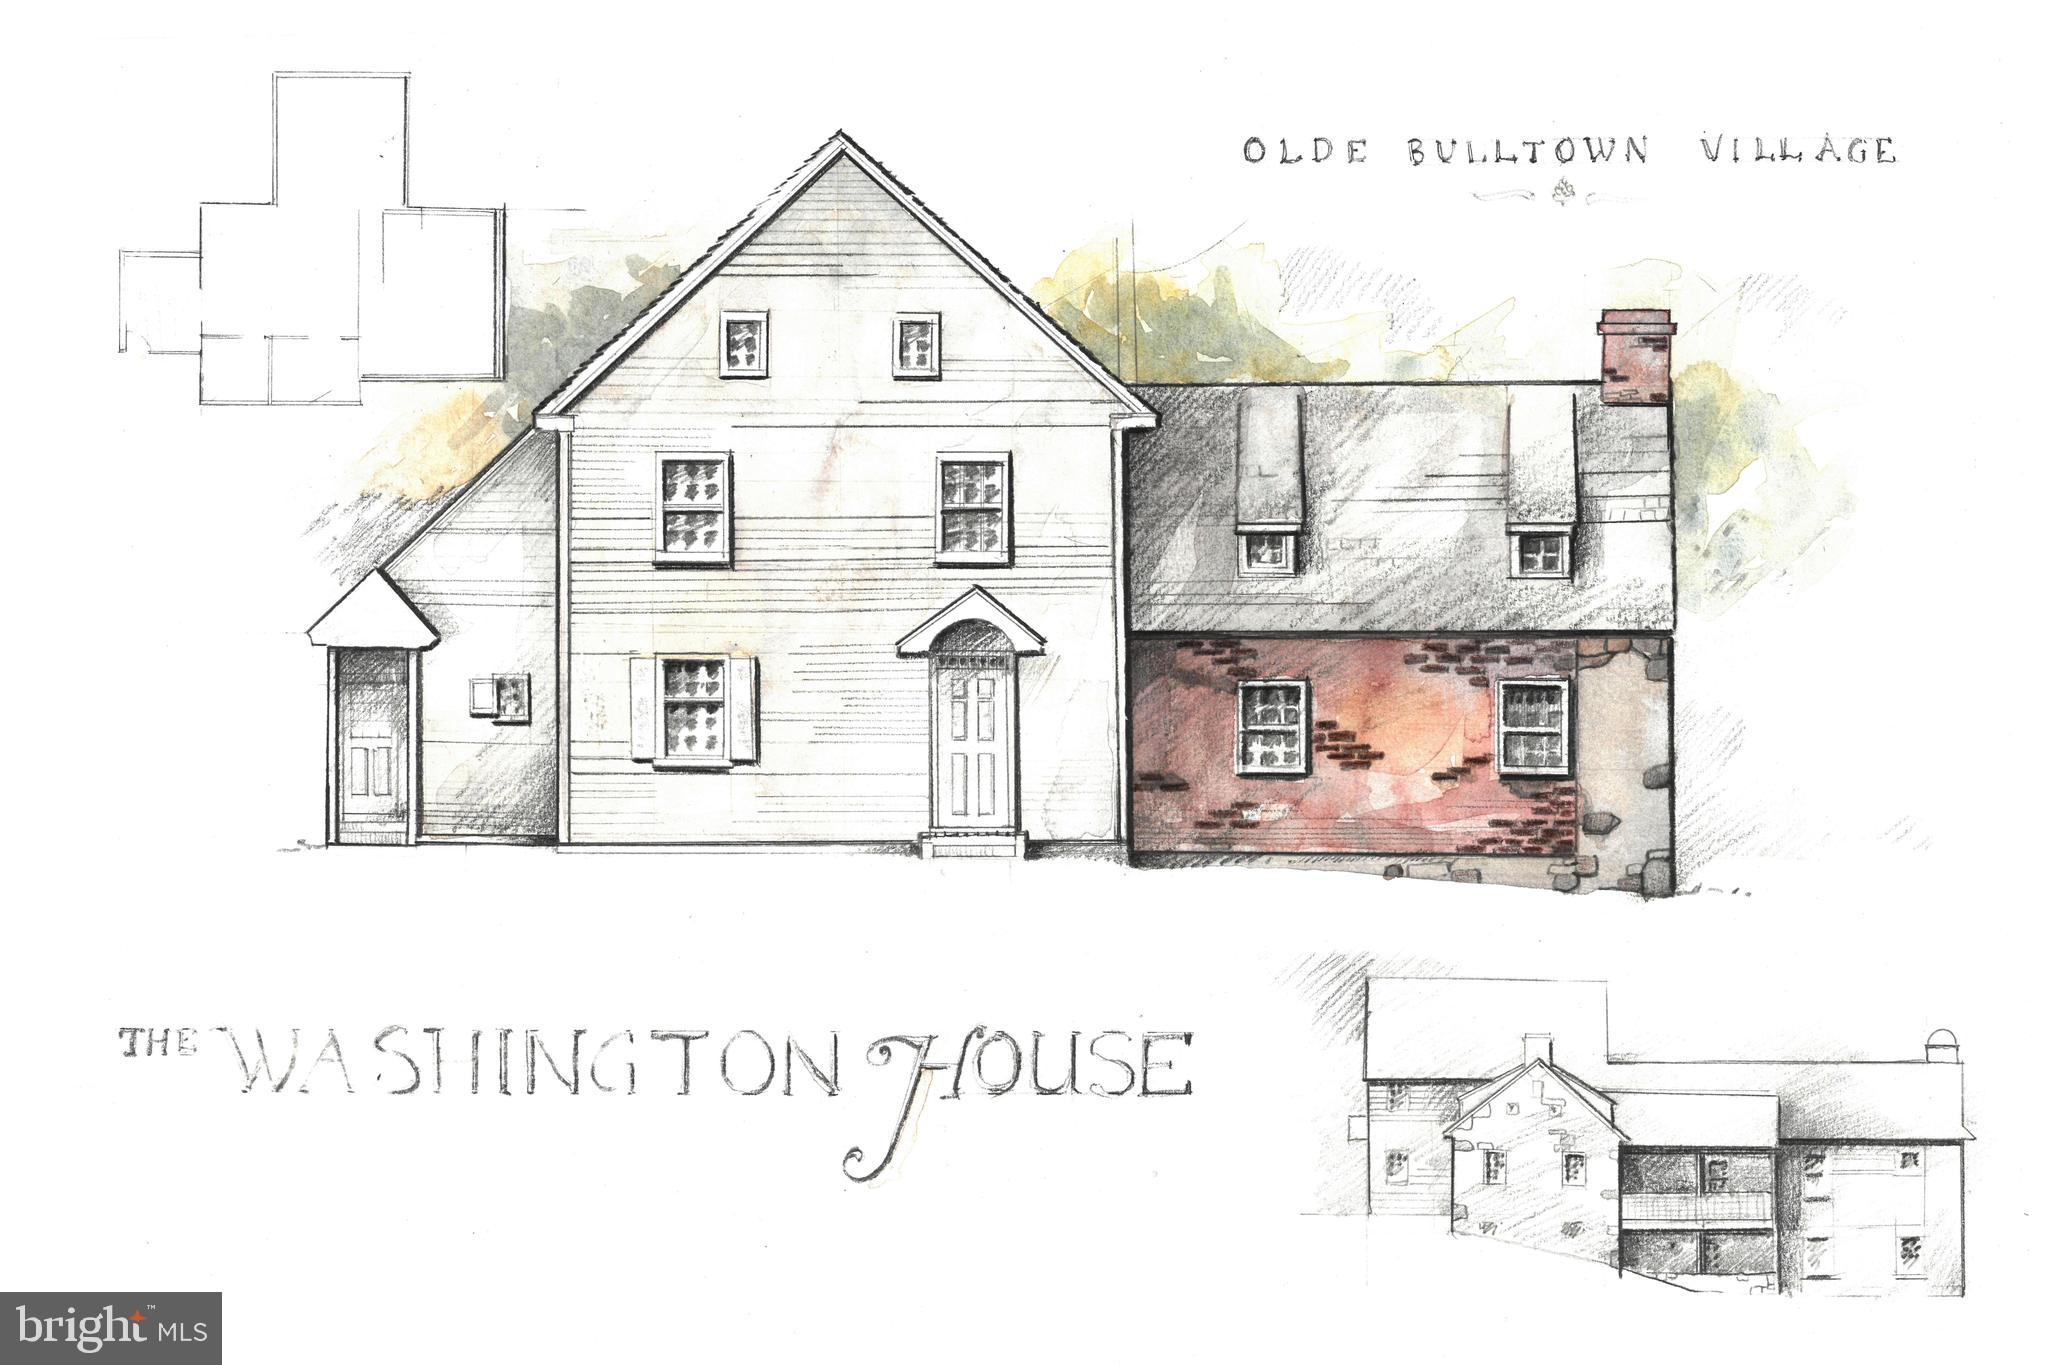 THE WASHINGTON HOUSE LOT #31 BROWNSTONE LANE, ELVERSON, PA 19520